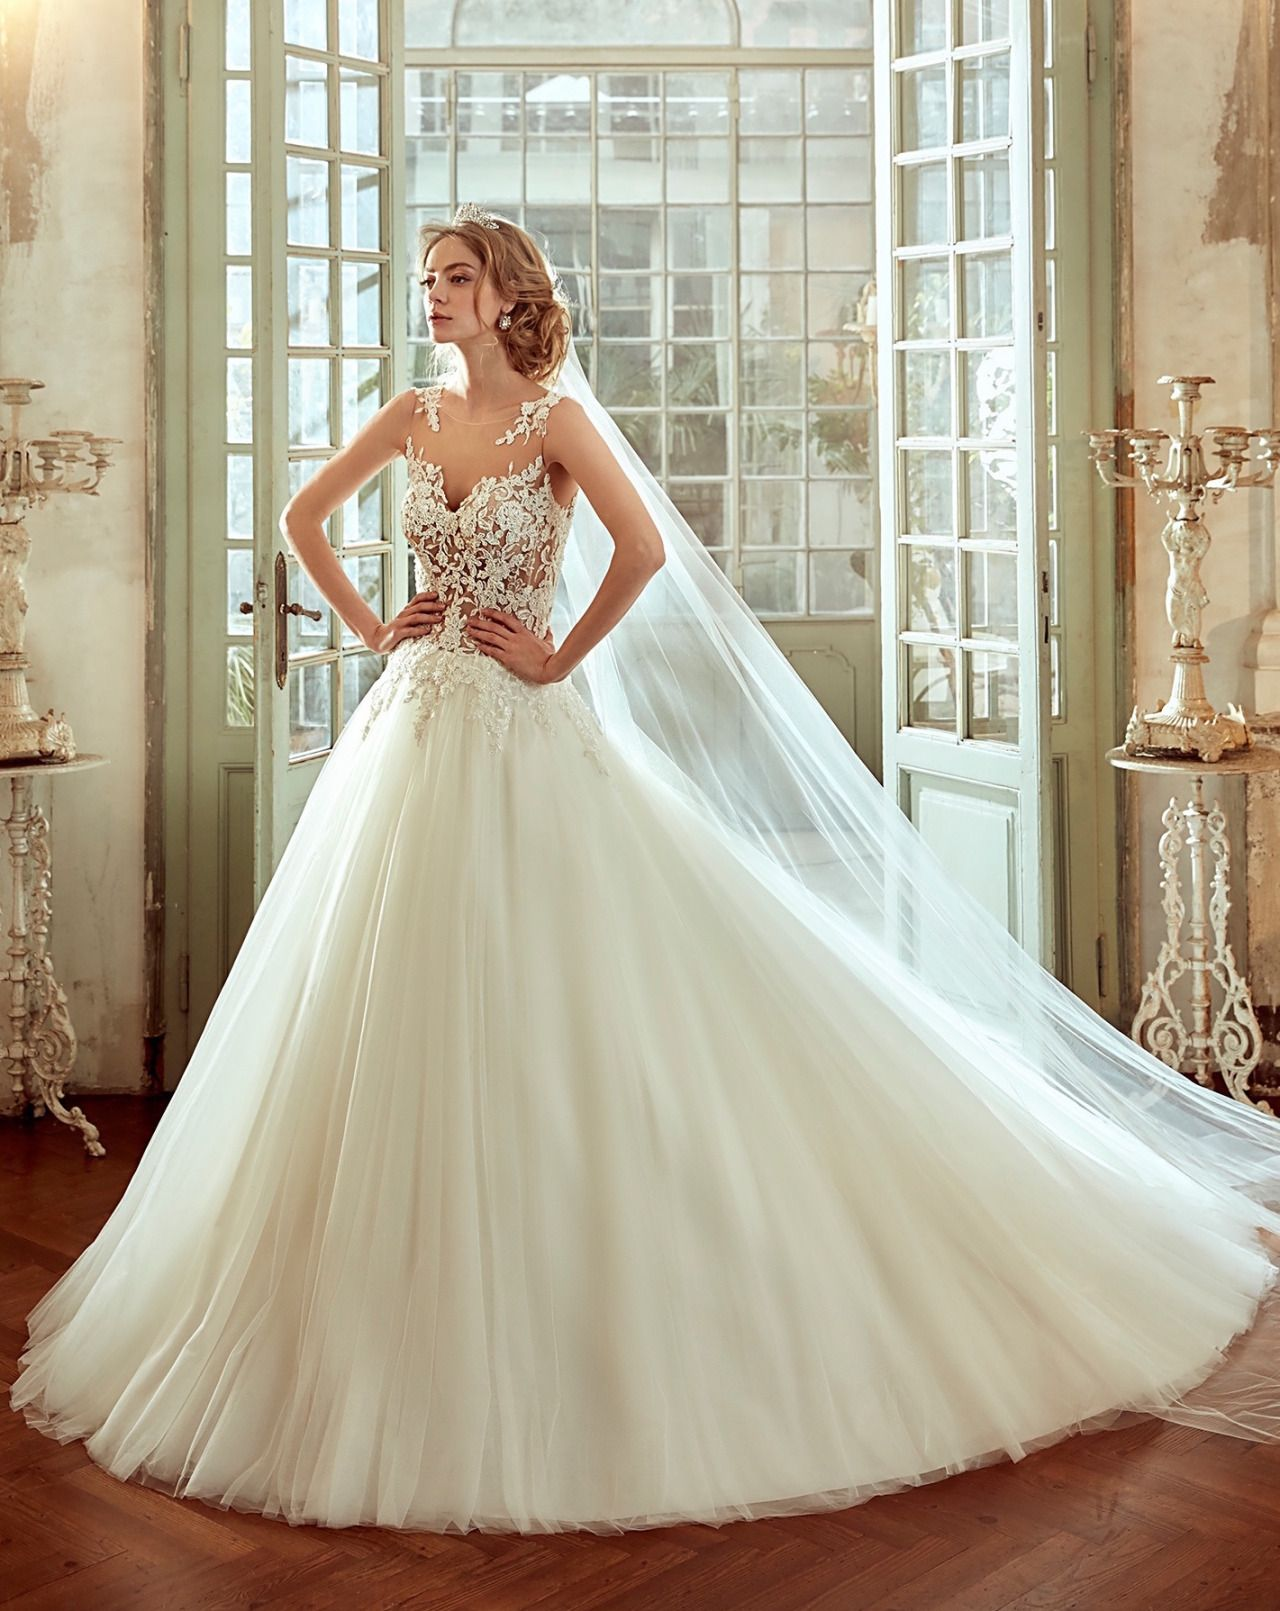 2019 year look- Wedding Elegant dresses tumblr